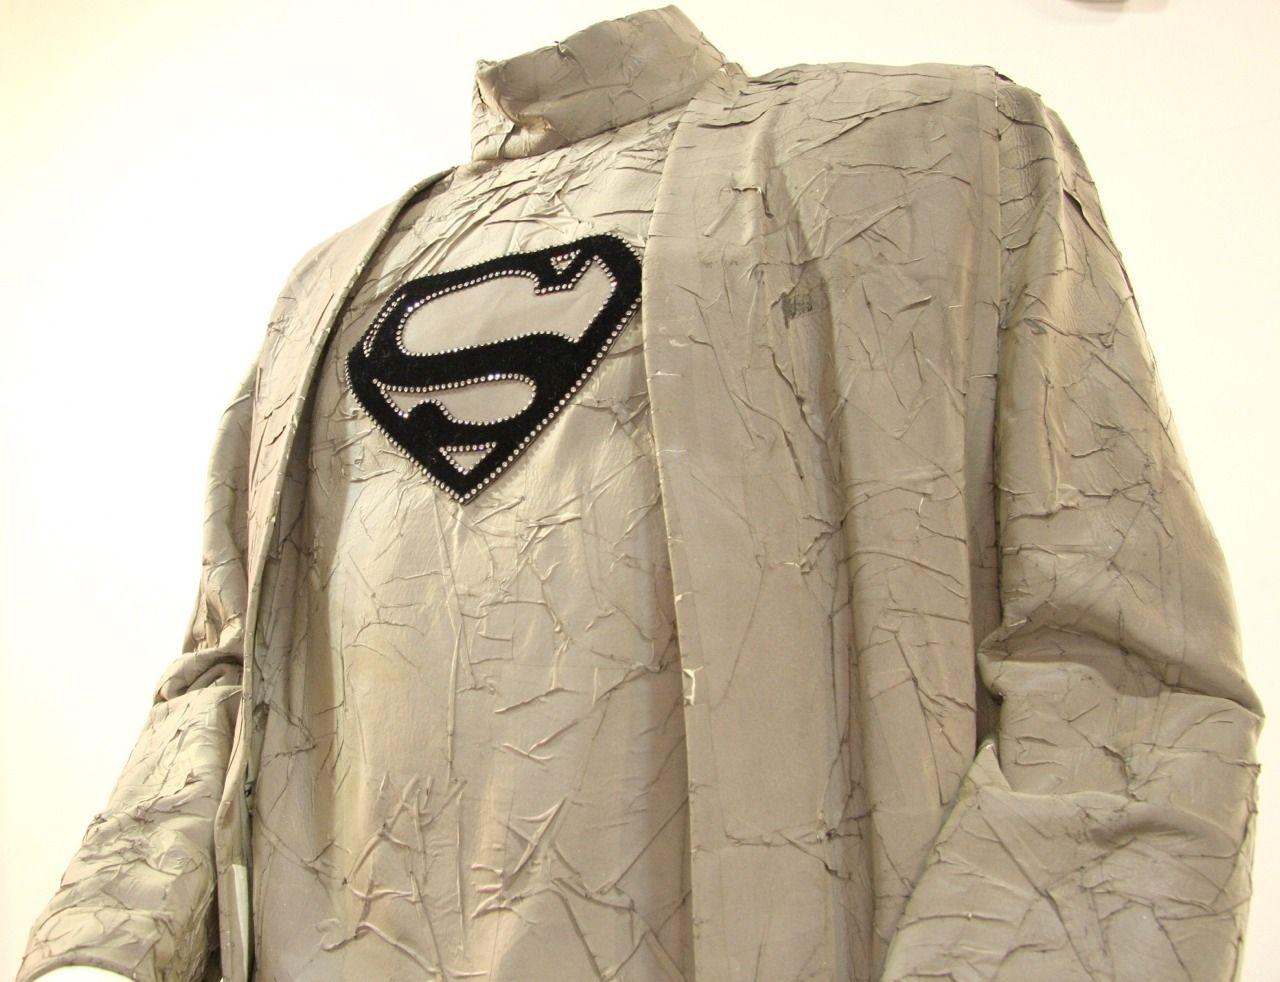 Marlon Brando Jor El costume from Superman The Movie